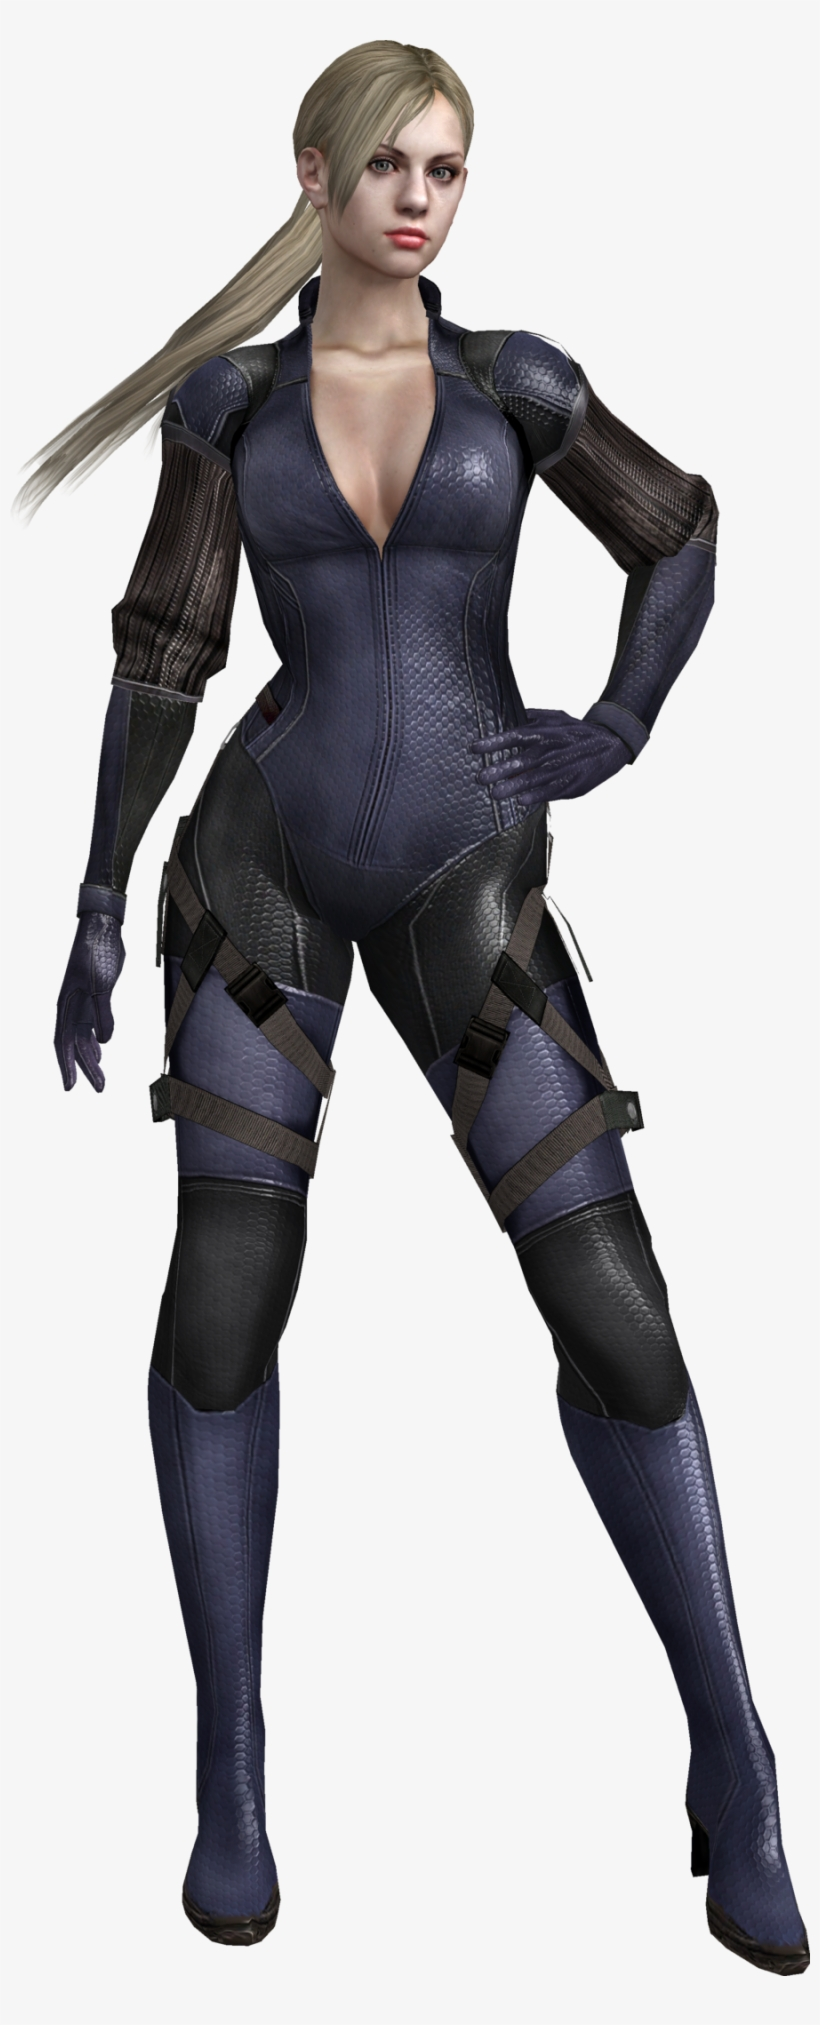 Jill Valentine From Resident Evil Jill Valentine Resident